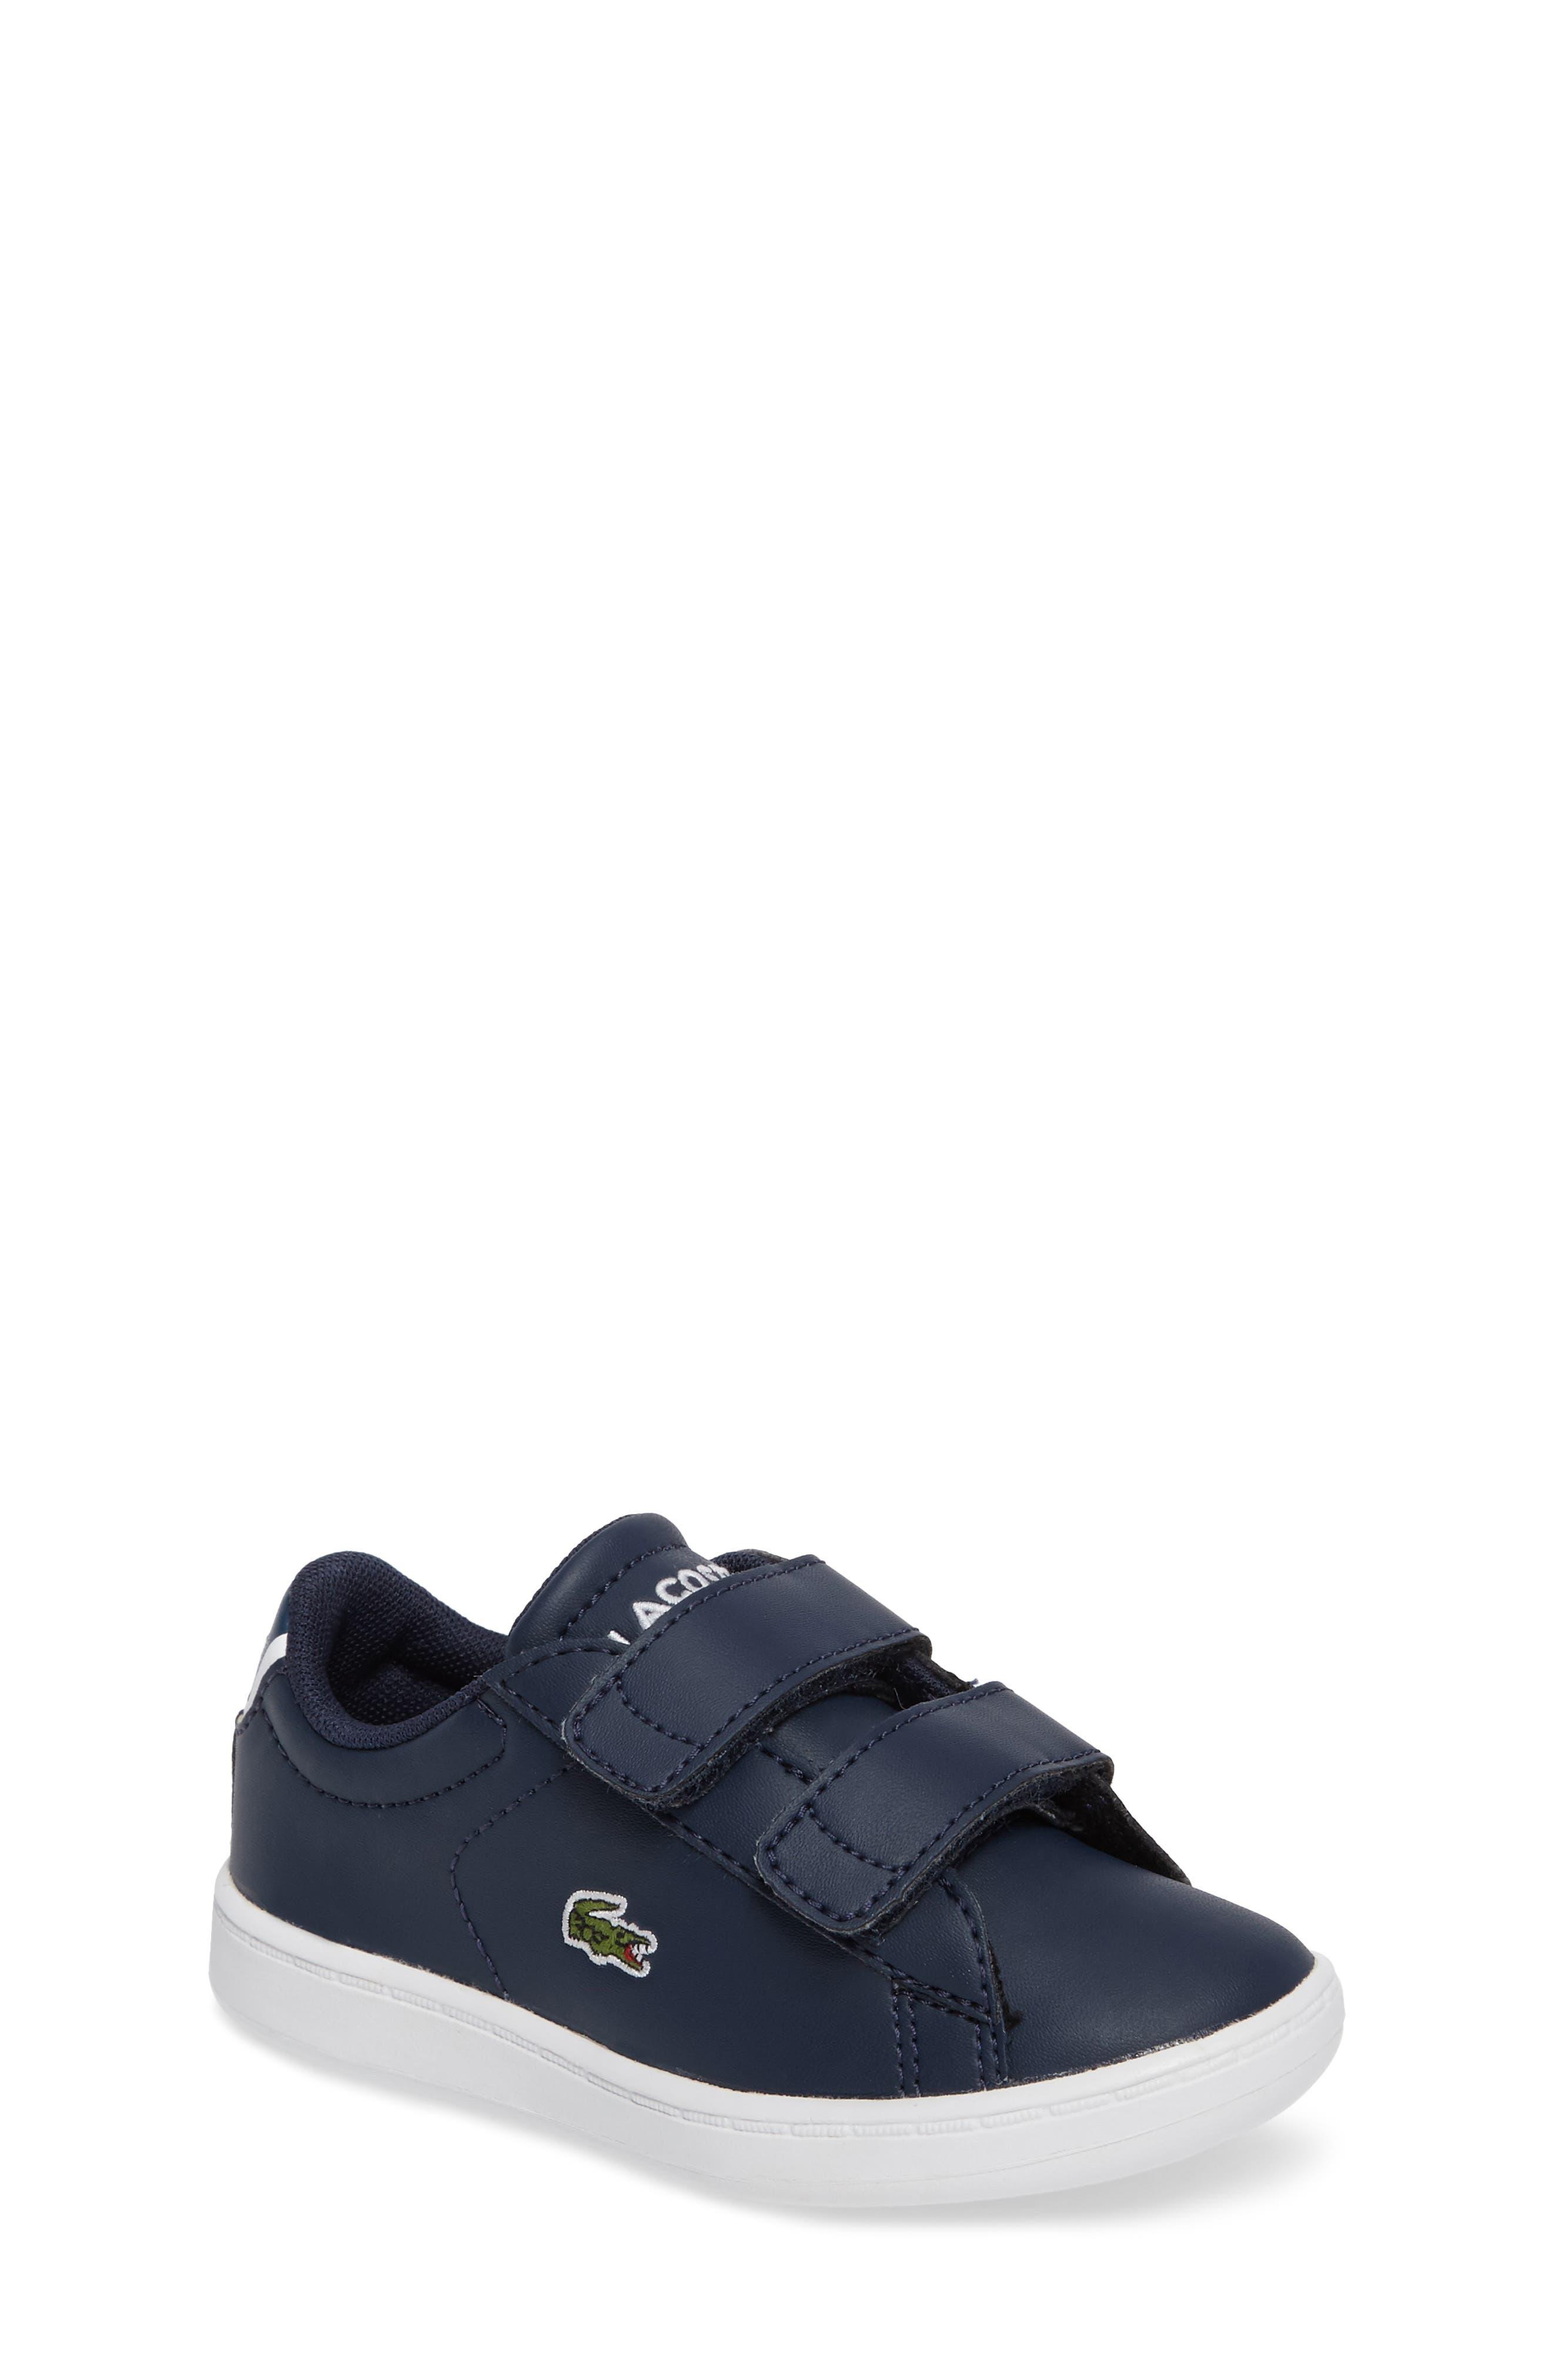 Carnaby Evo Sneaker,                         Main,                         color, 428